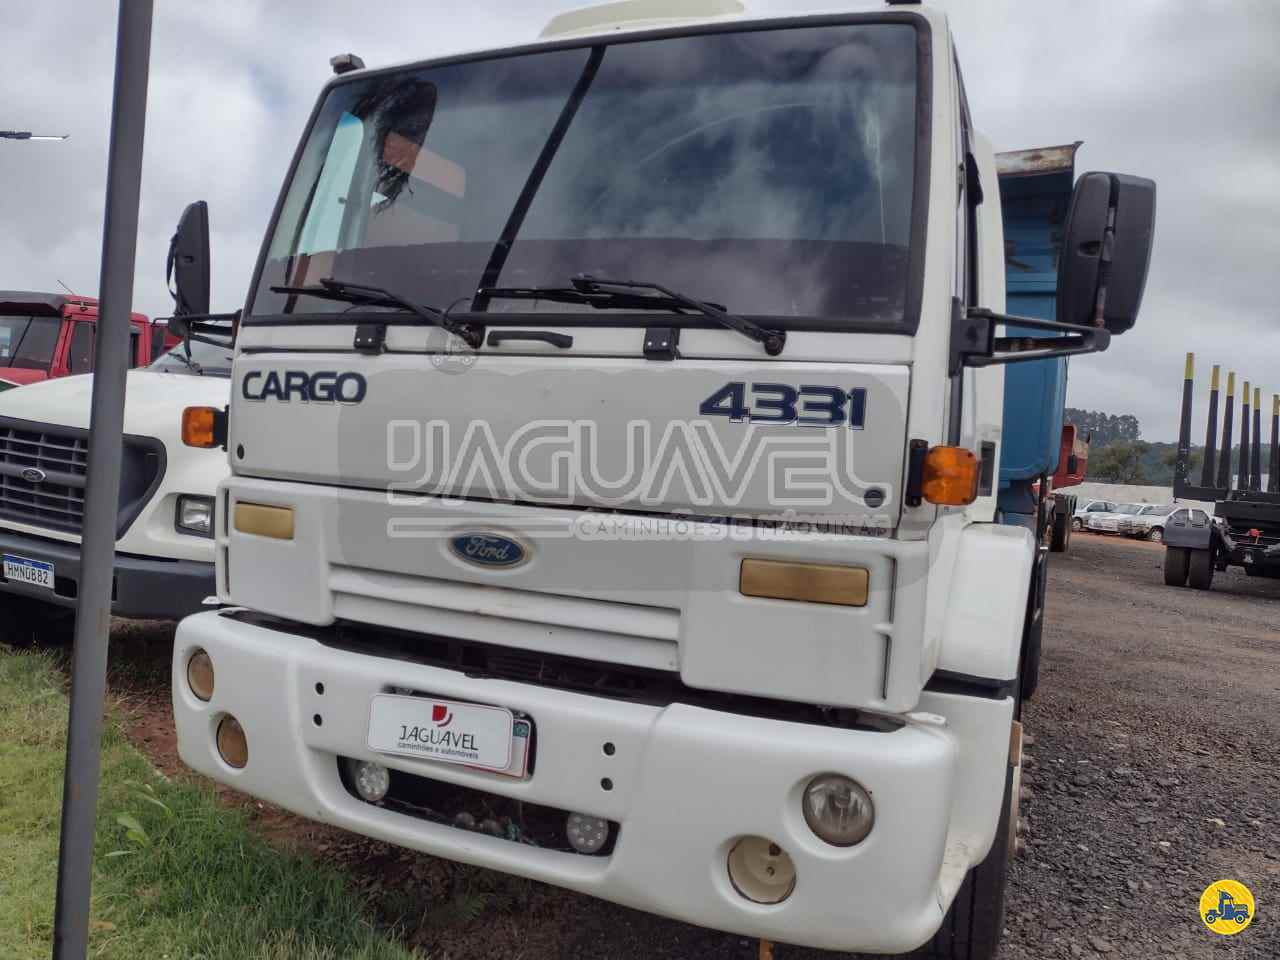 CARGO 4331 de Jaguavel Caminhões - JAGUARIAIVA/PR